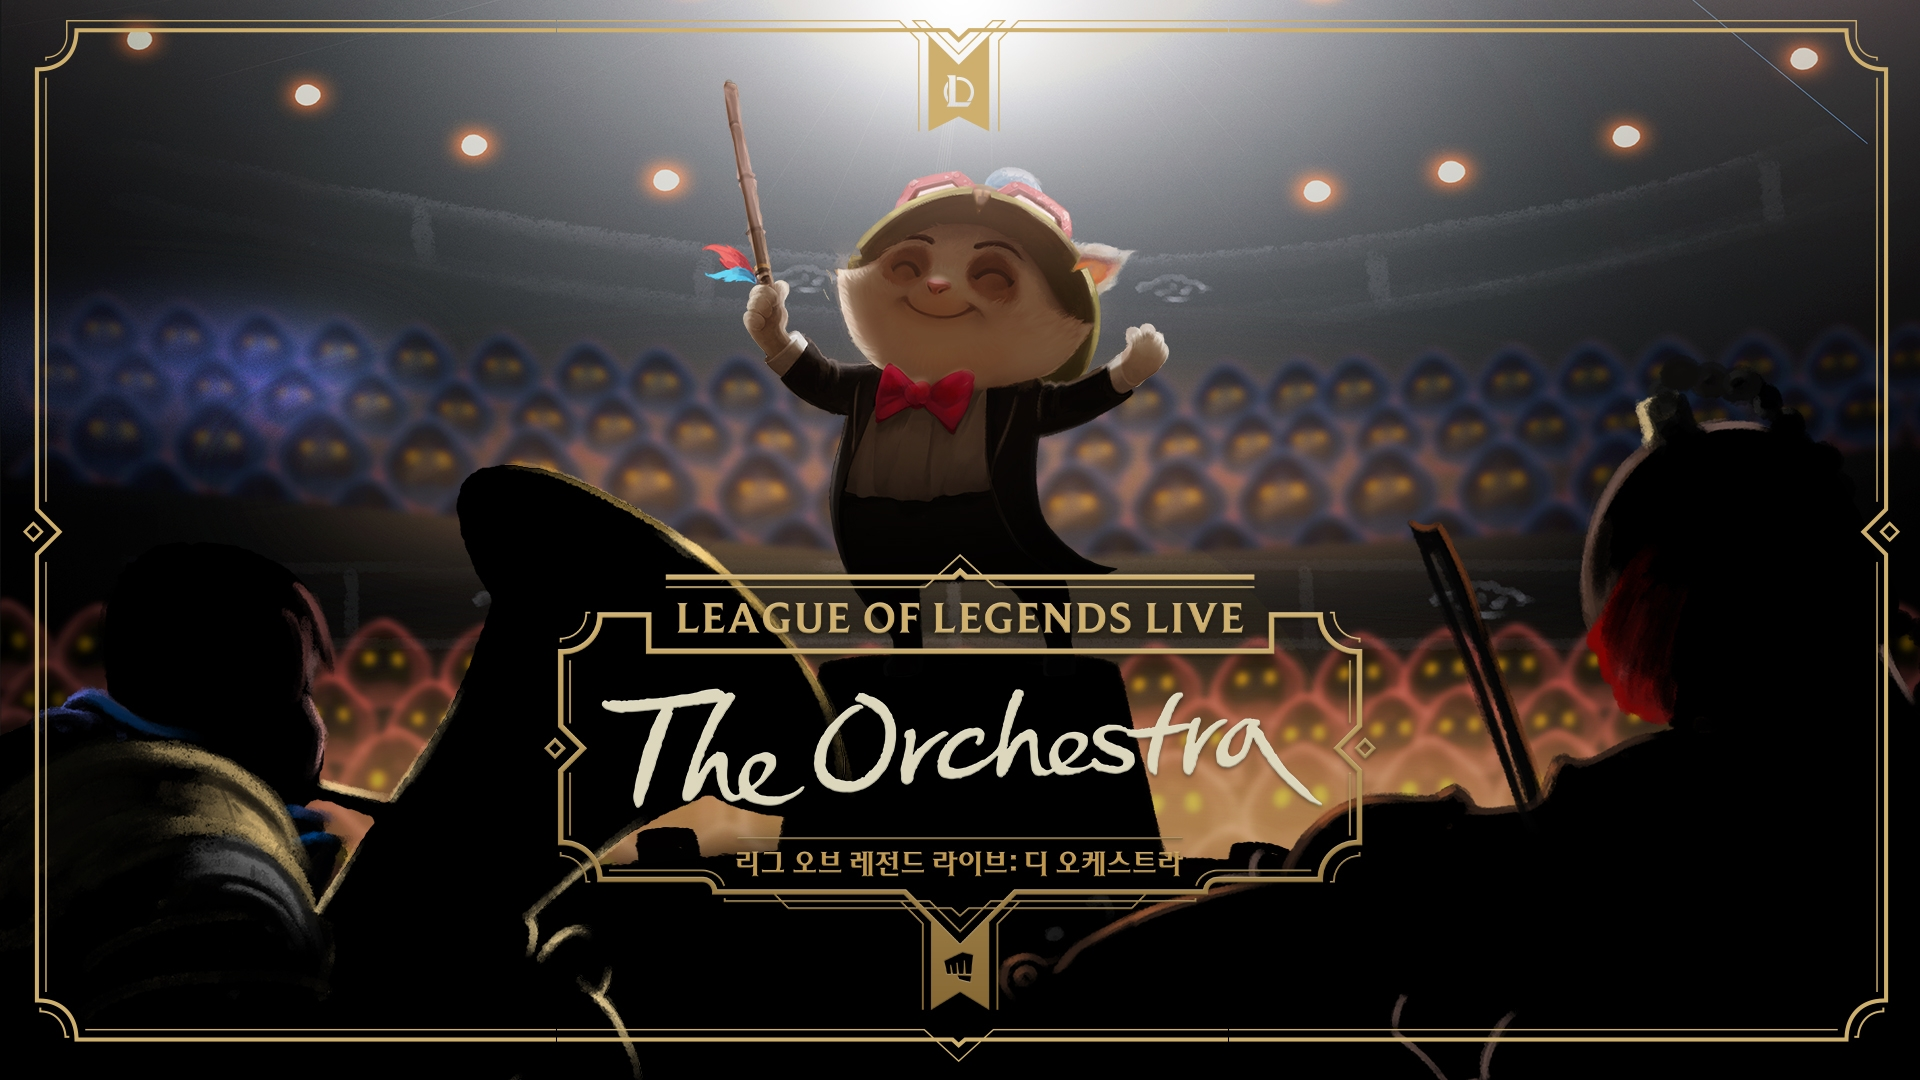 LoL Live: The Orchestra - 리그 오브 레전드